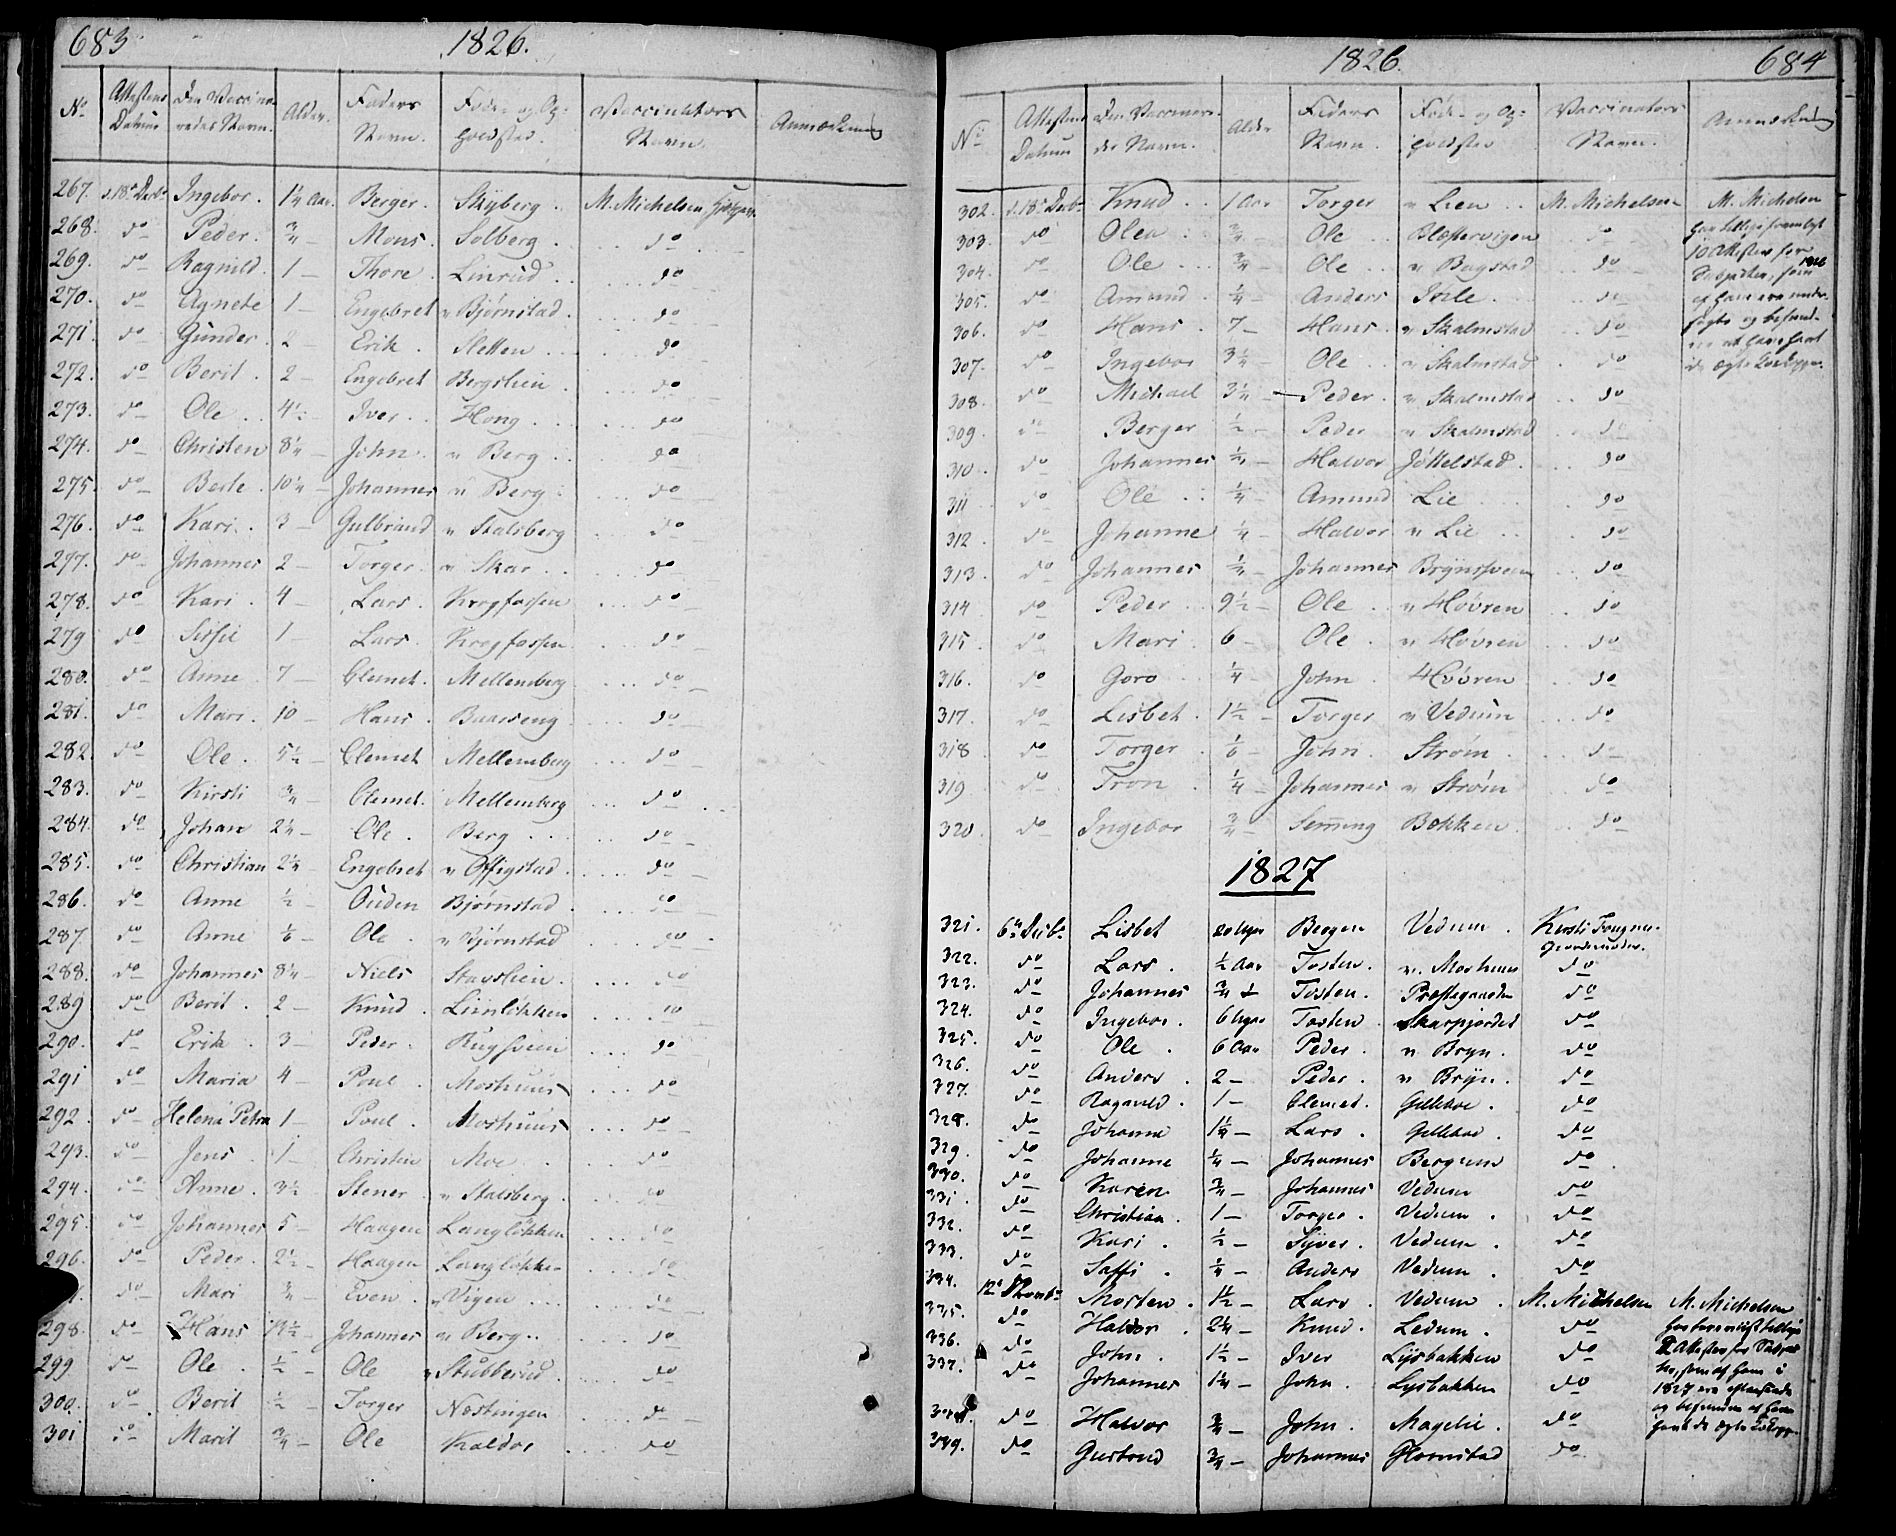 SAH, Øyer prestekontor, Ministerialbok nr. 4, 1824-1841, s. 683-684